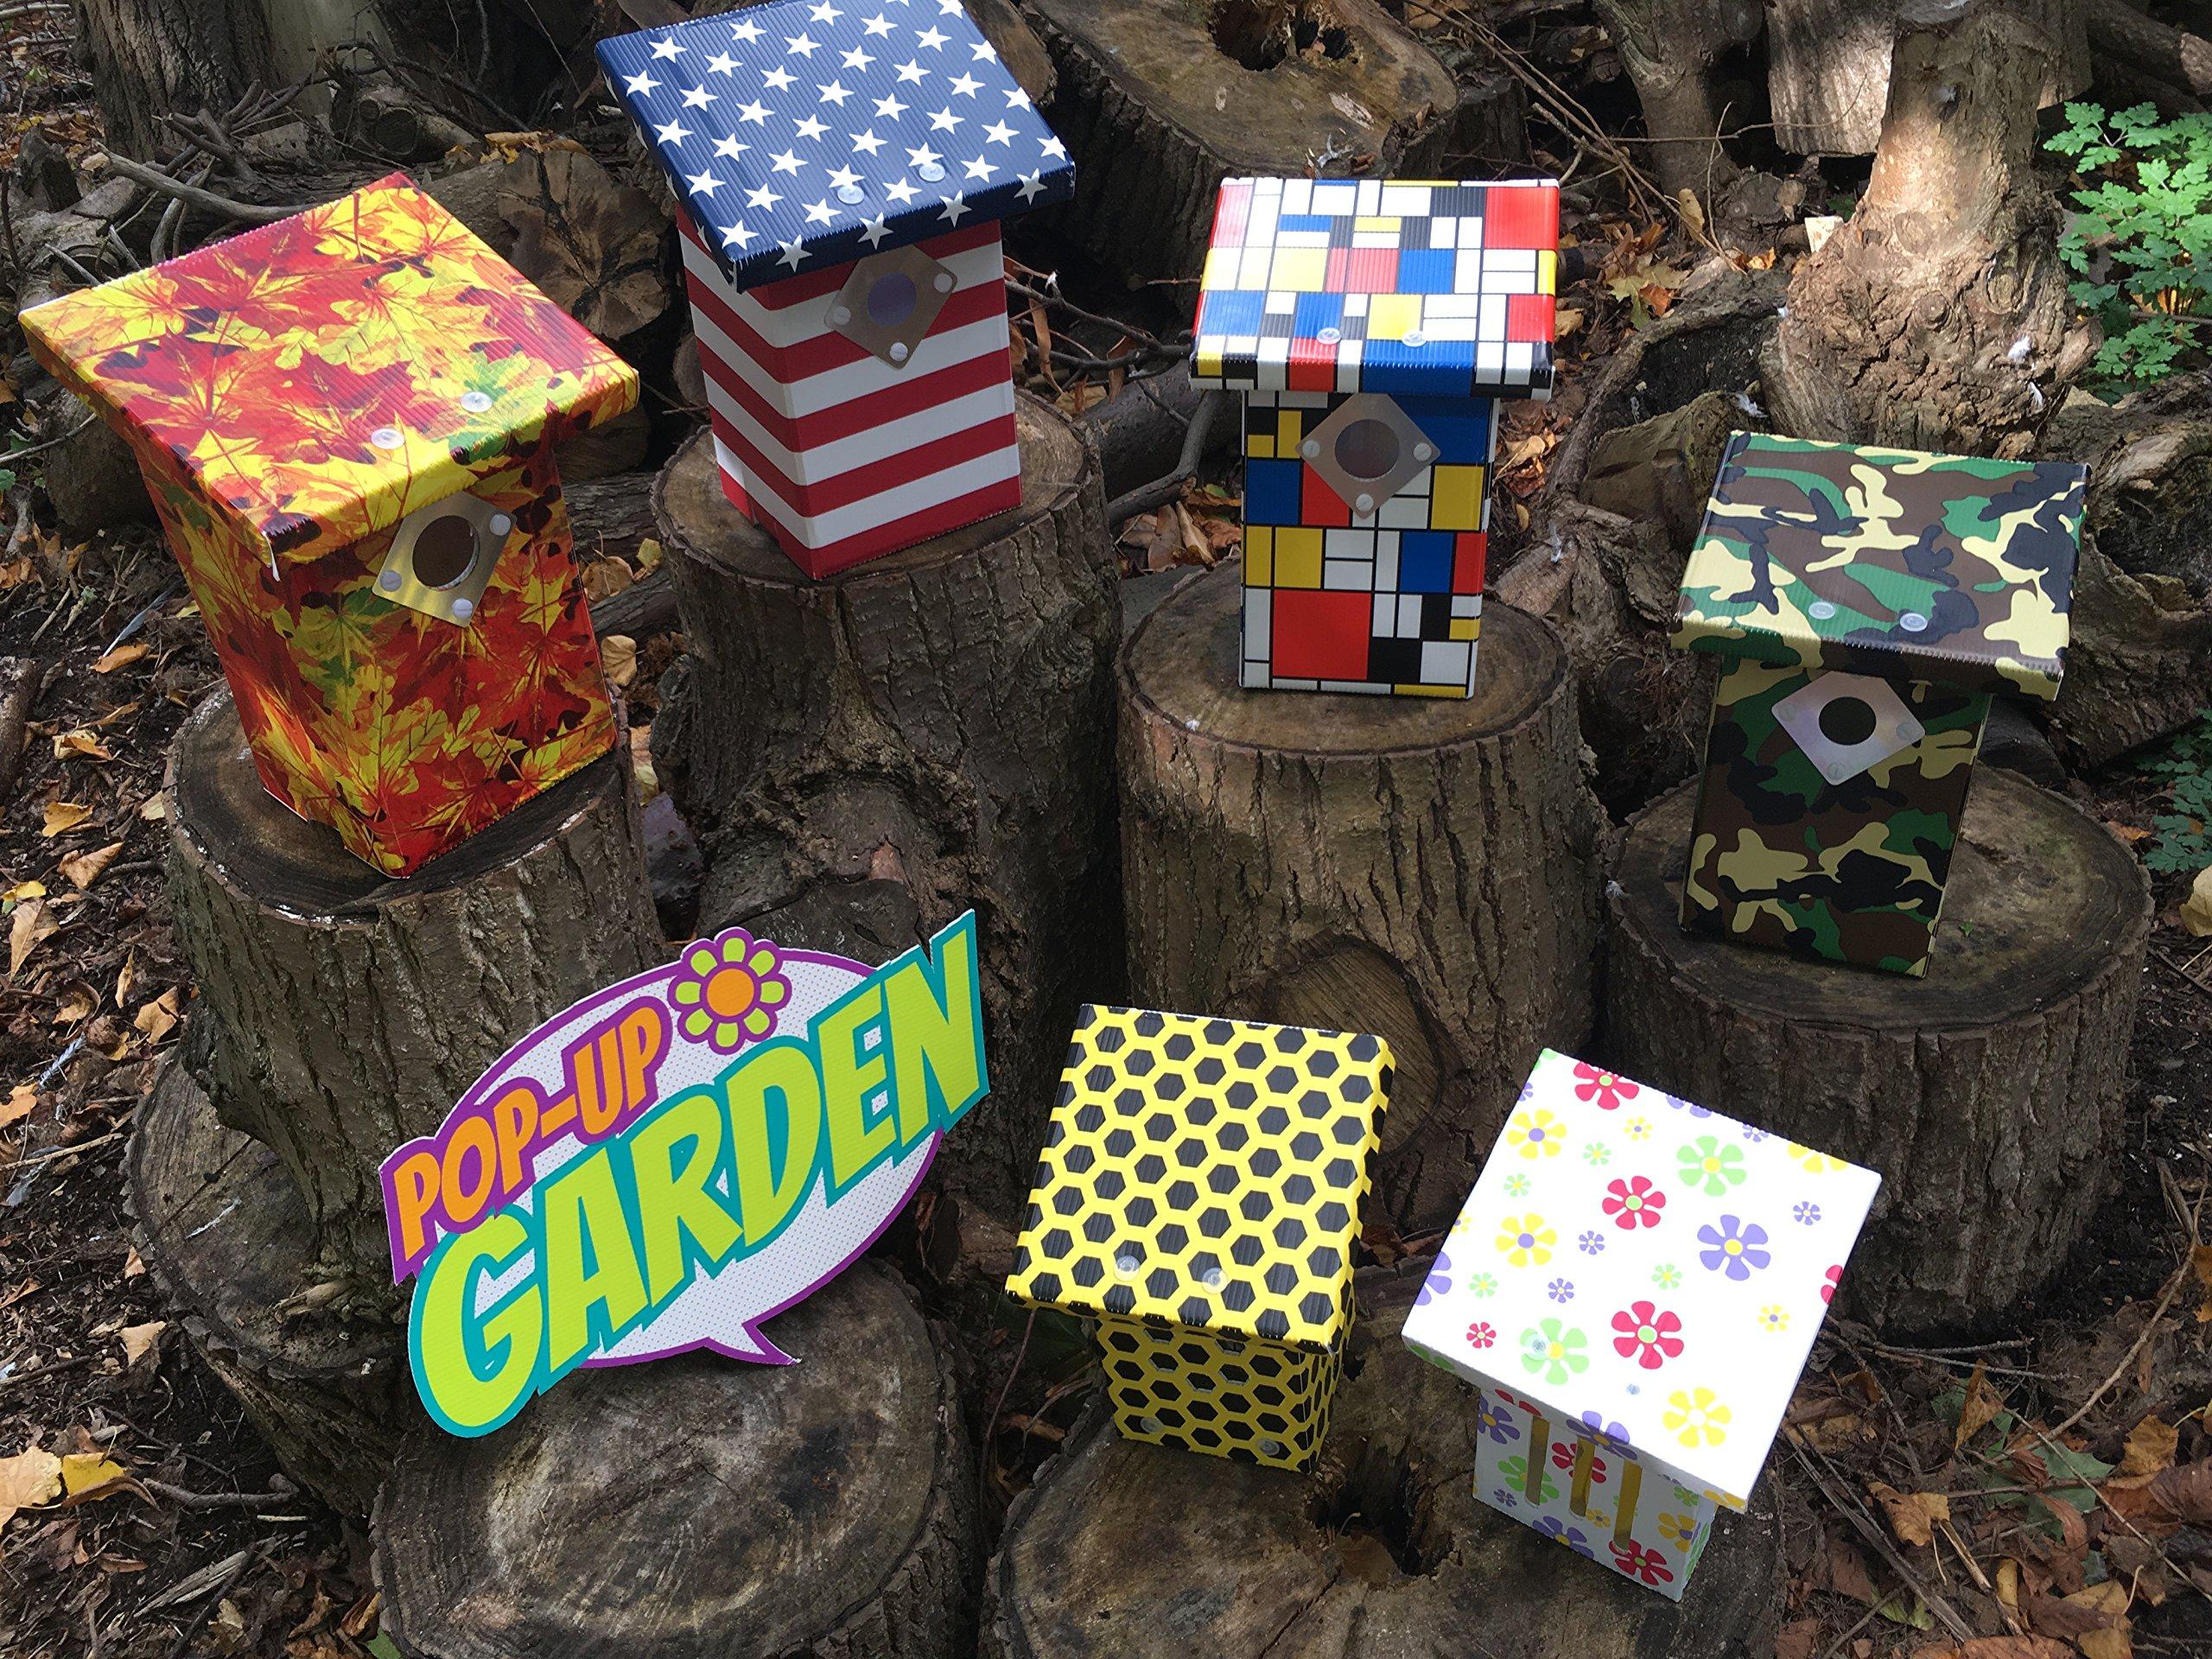 Pop-Up Garden Crazy Daisy Butterfly Hotel Box Kit, 100% Recyclable, Eco-Friendly